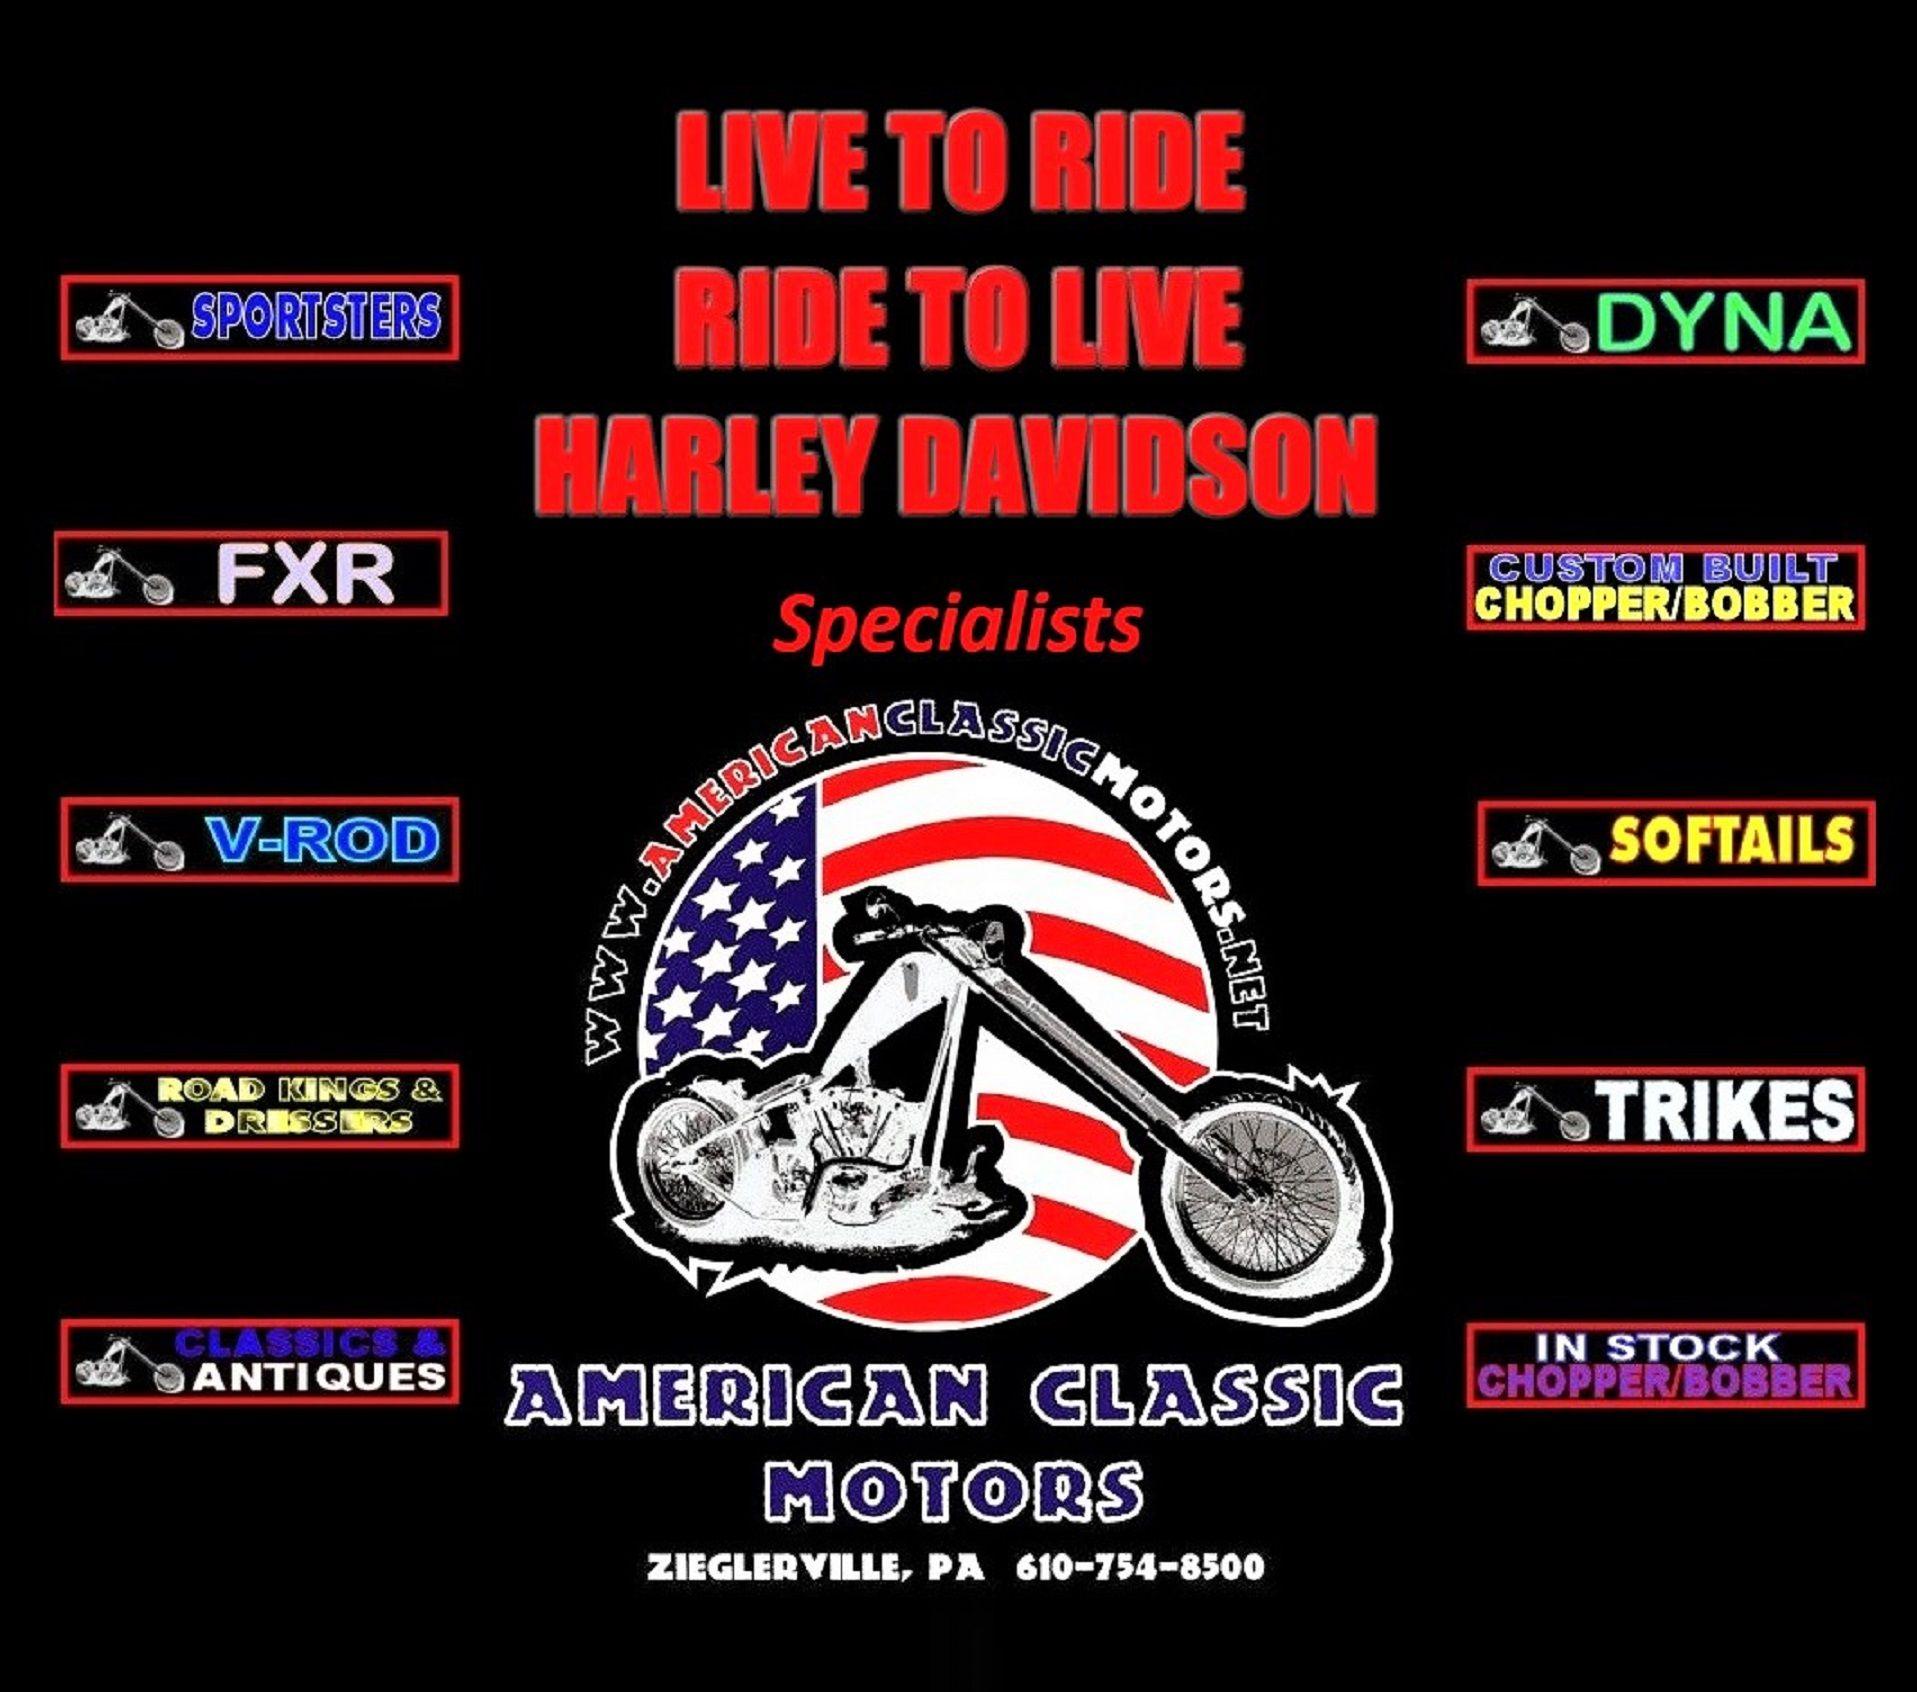 Acm American Classic Motors Http Americanclassicmotors Net